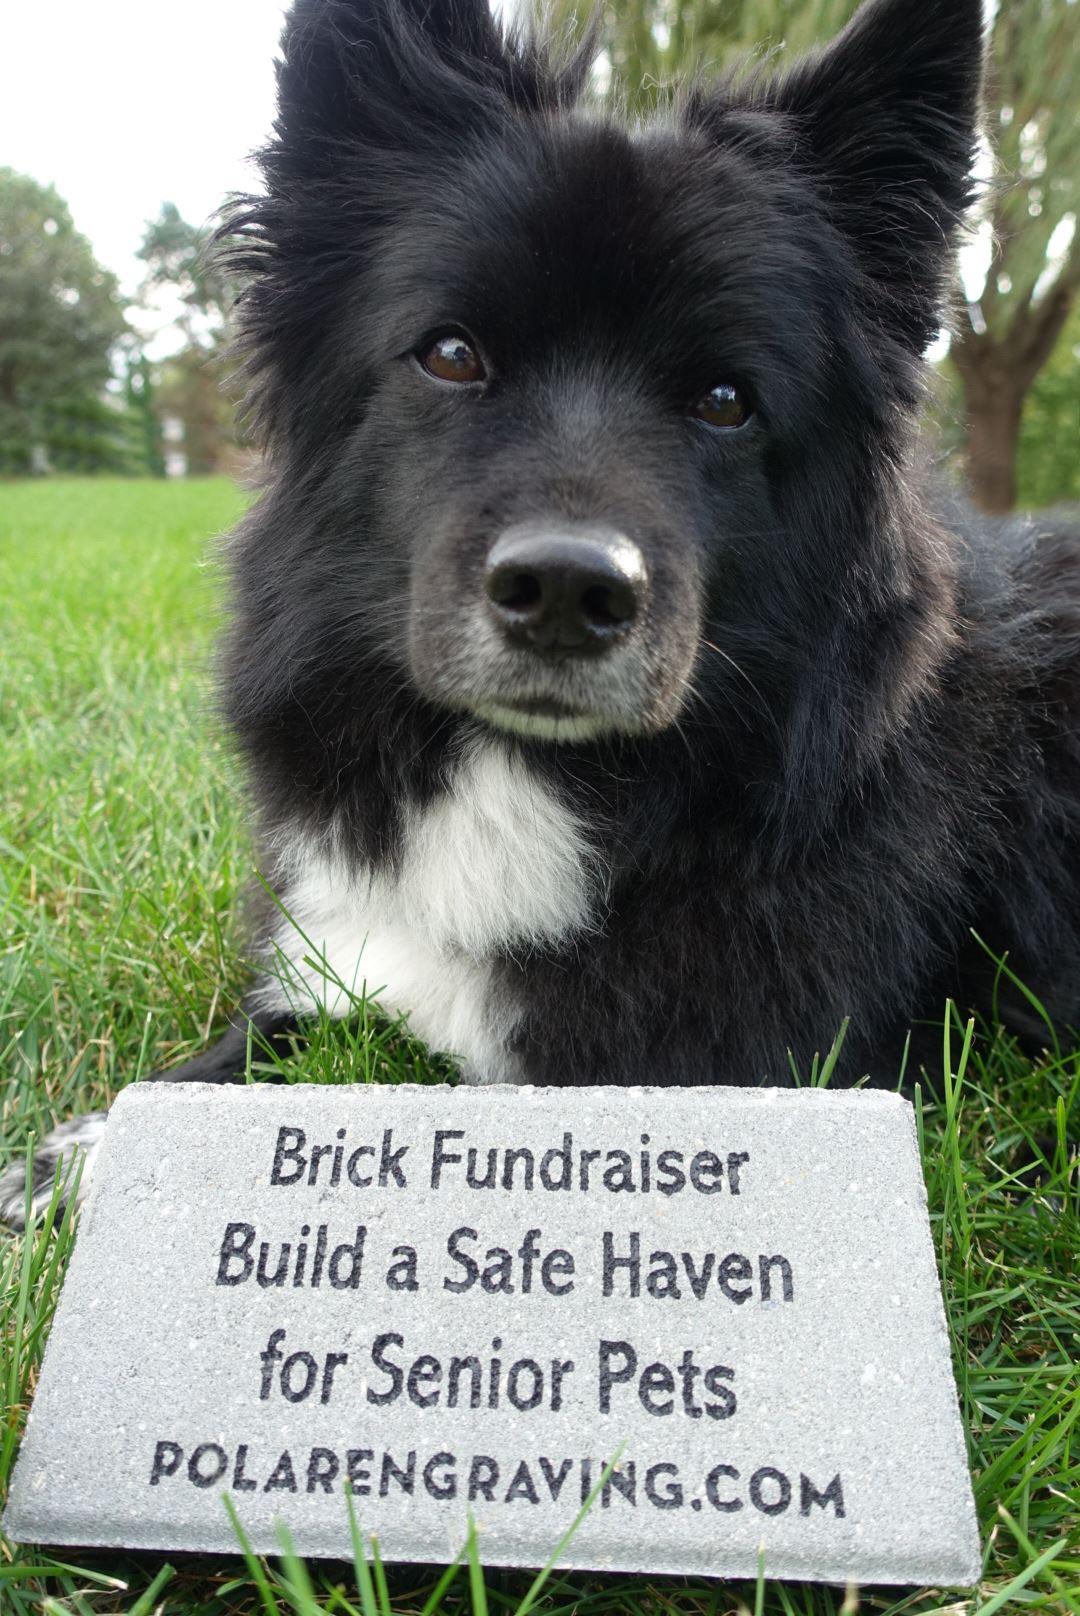 Brick Fundraiser